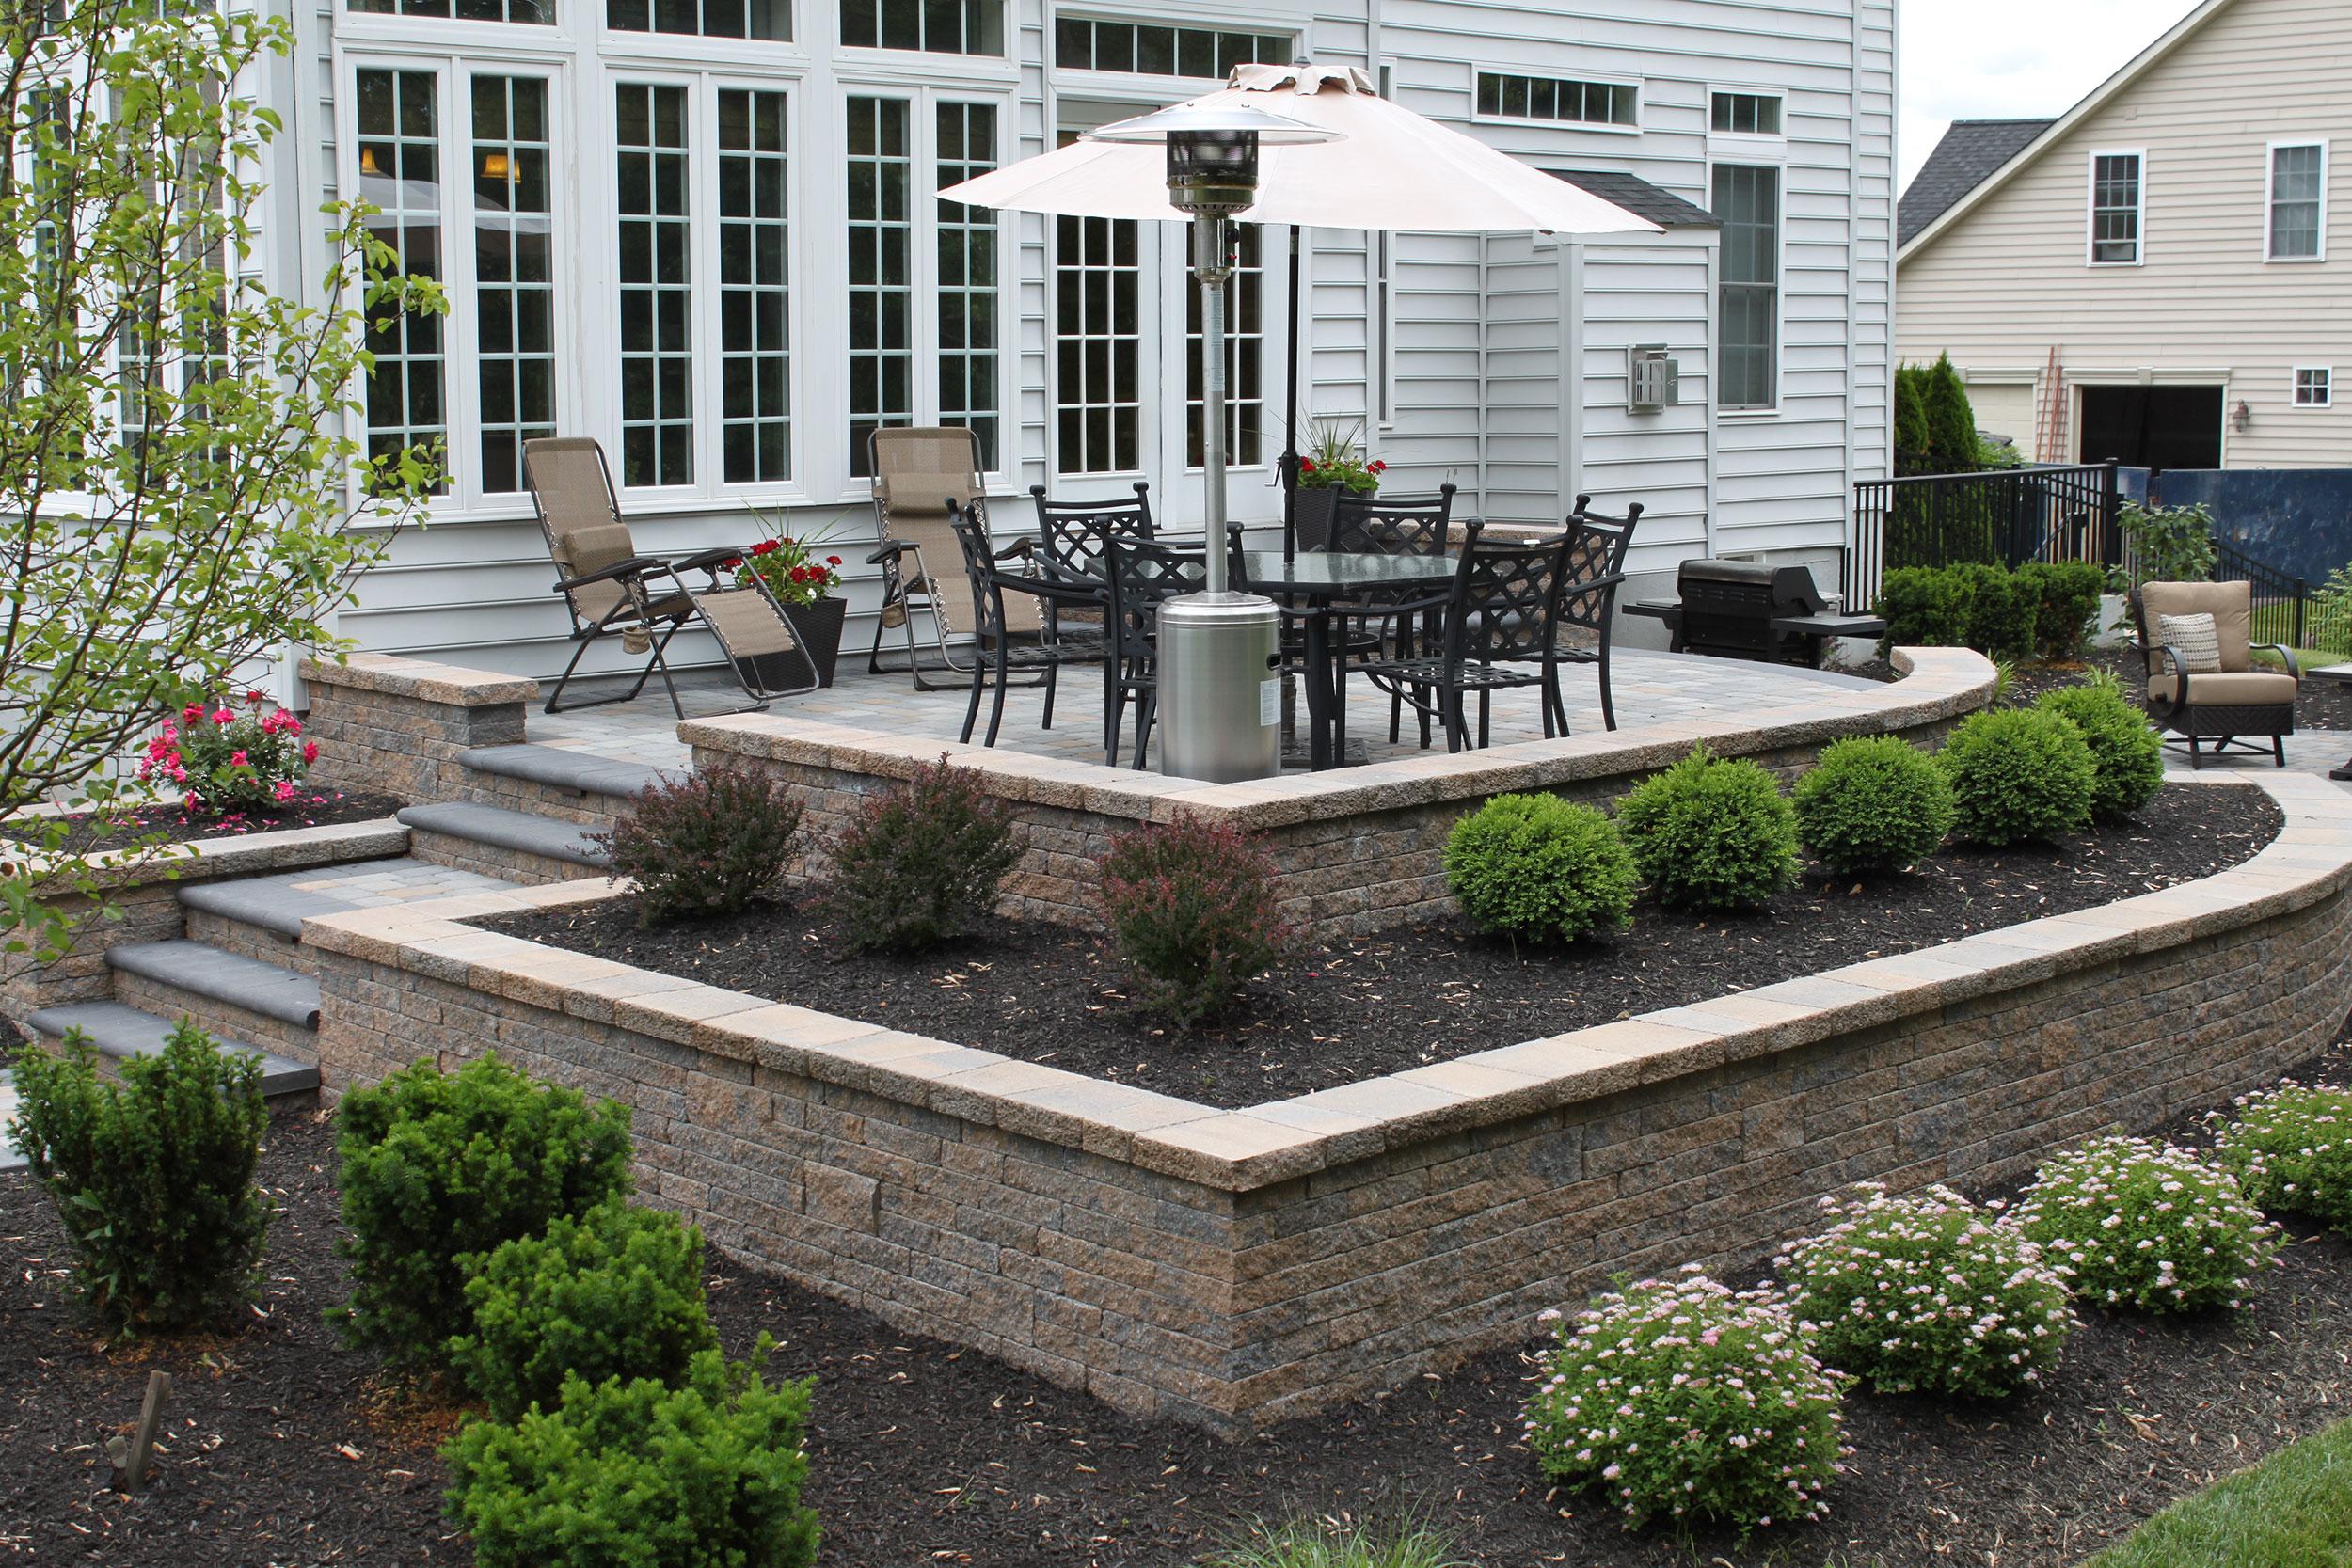 Furlong Pa Small Patio   R&R Caddick Landscape Design on Patio Block Wall Ideas id=82720